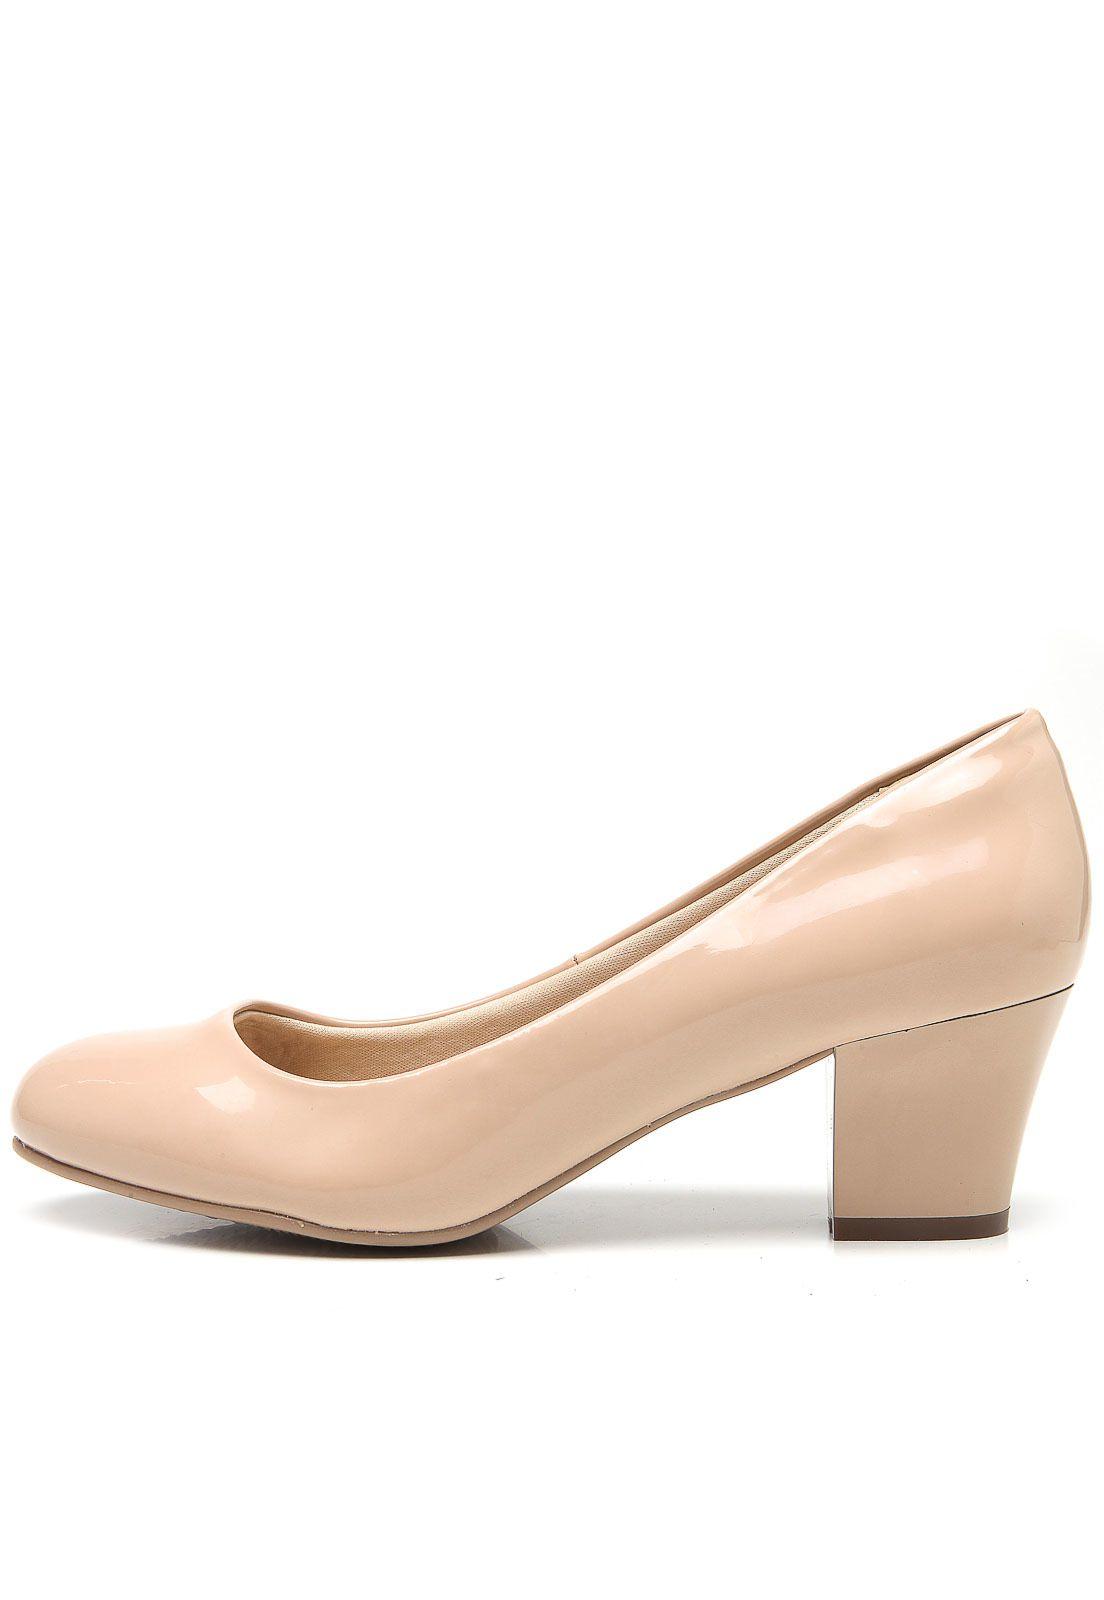 Sapato Feminino Facinelli 62402 Bico Redondo Salto Médio